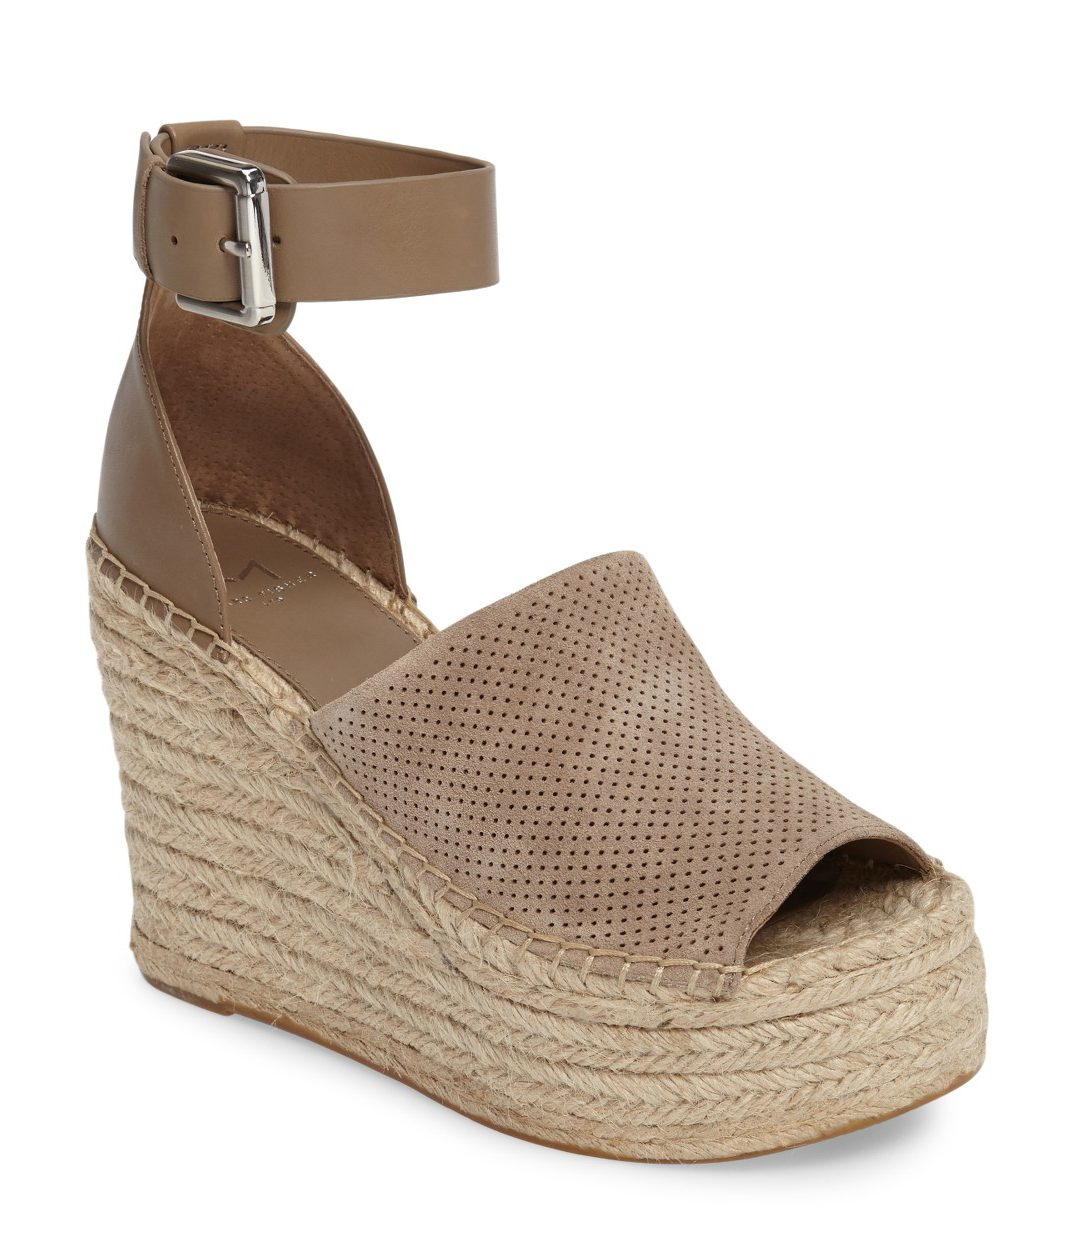 Spring 'IT' shoe